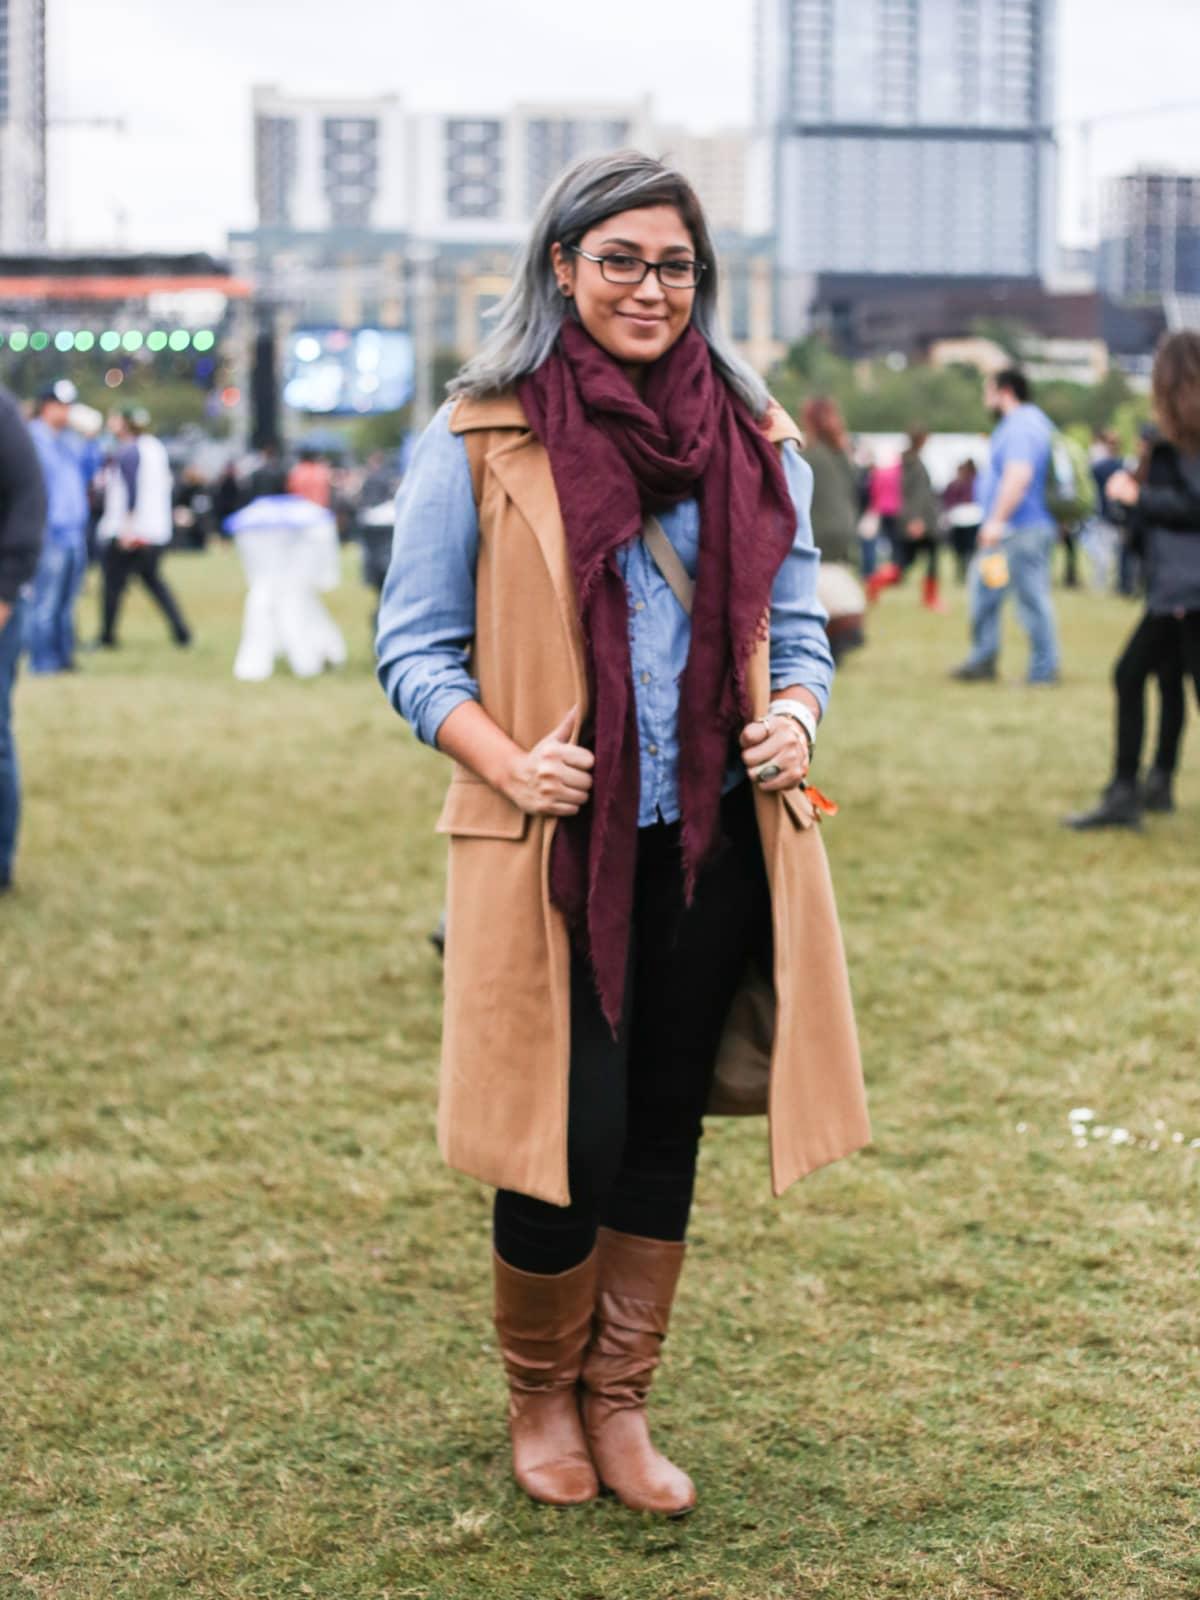 Fun Fun Fun Fest 2015 Fashion Style Mercedes Cruz